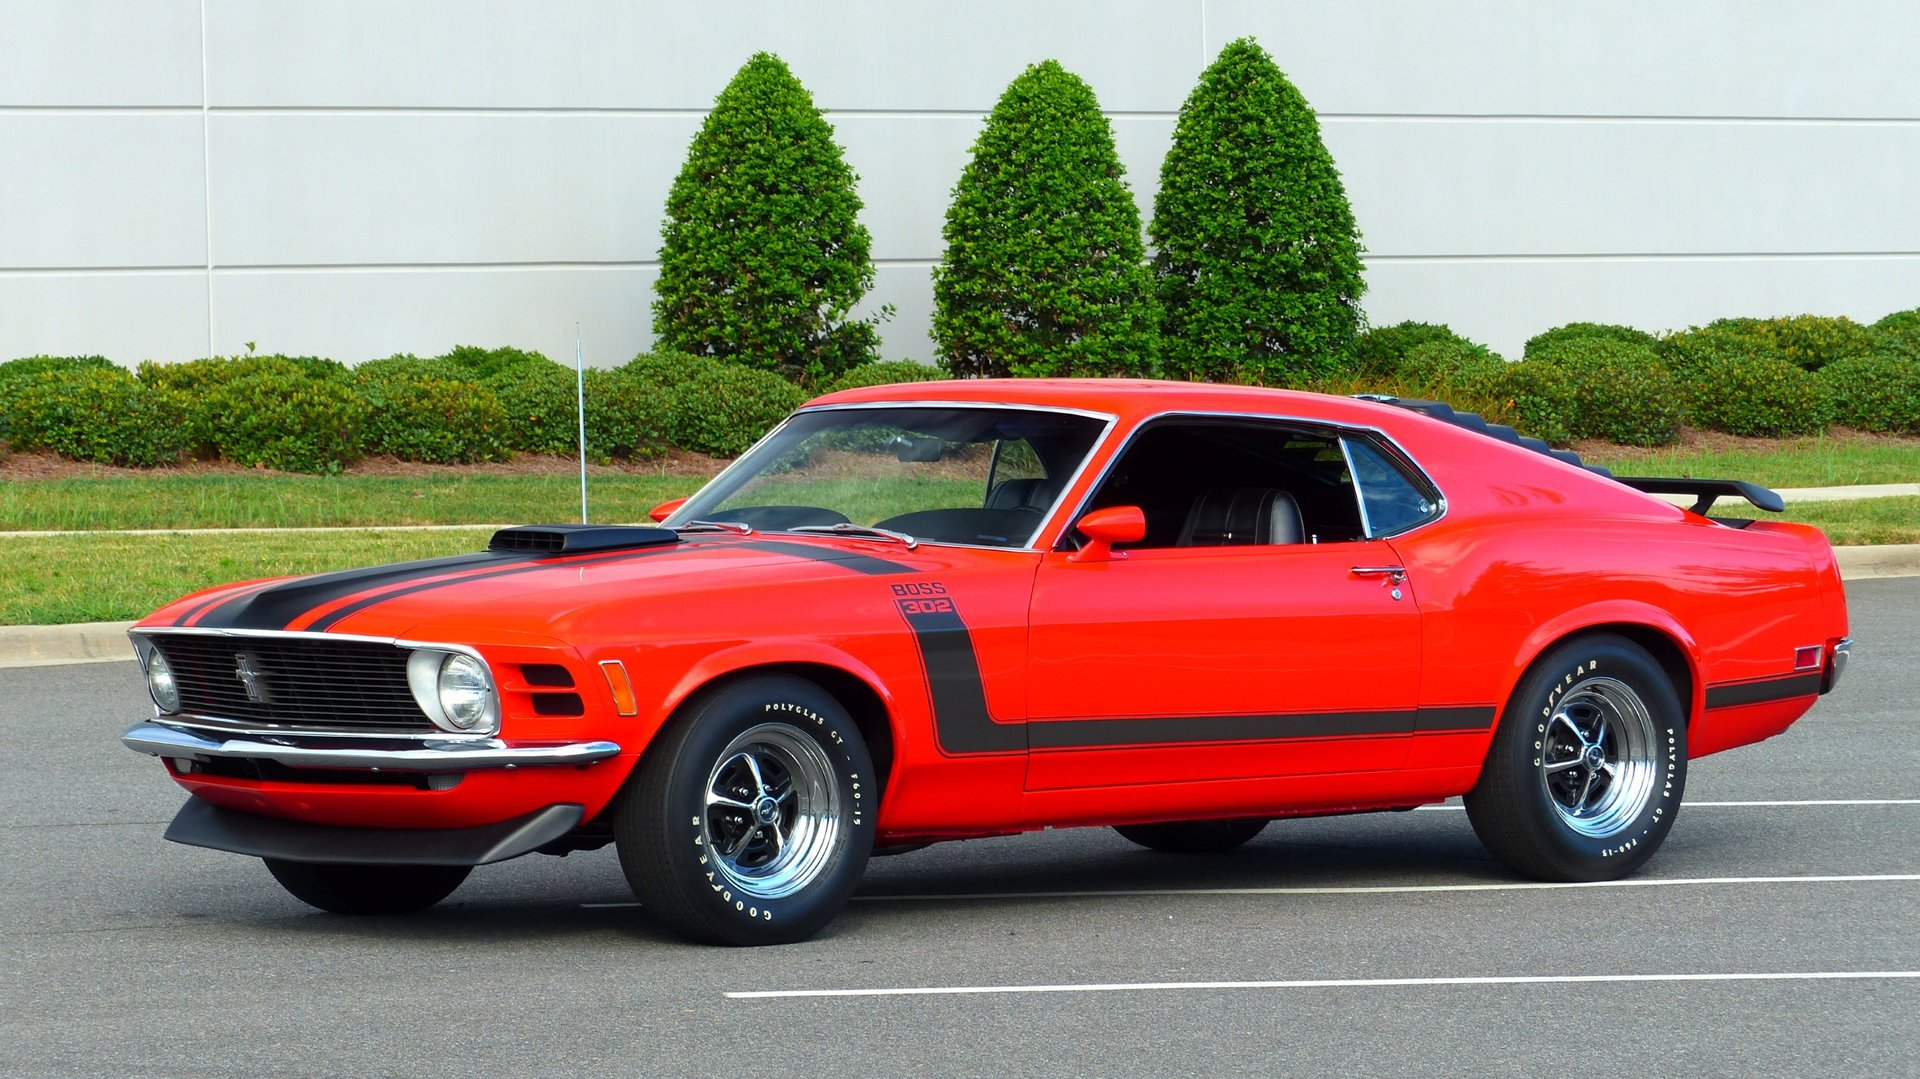 1970 Ford Mustang Gaa Classic Cars Boss 302